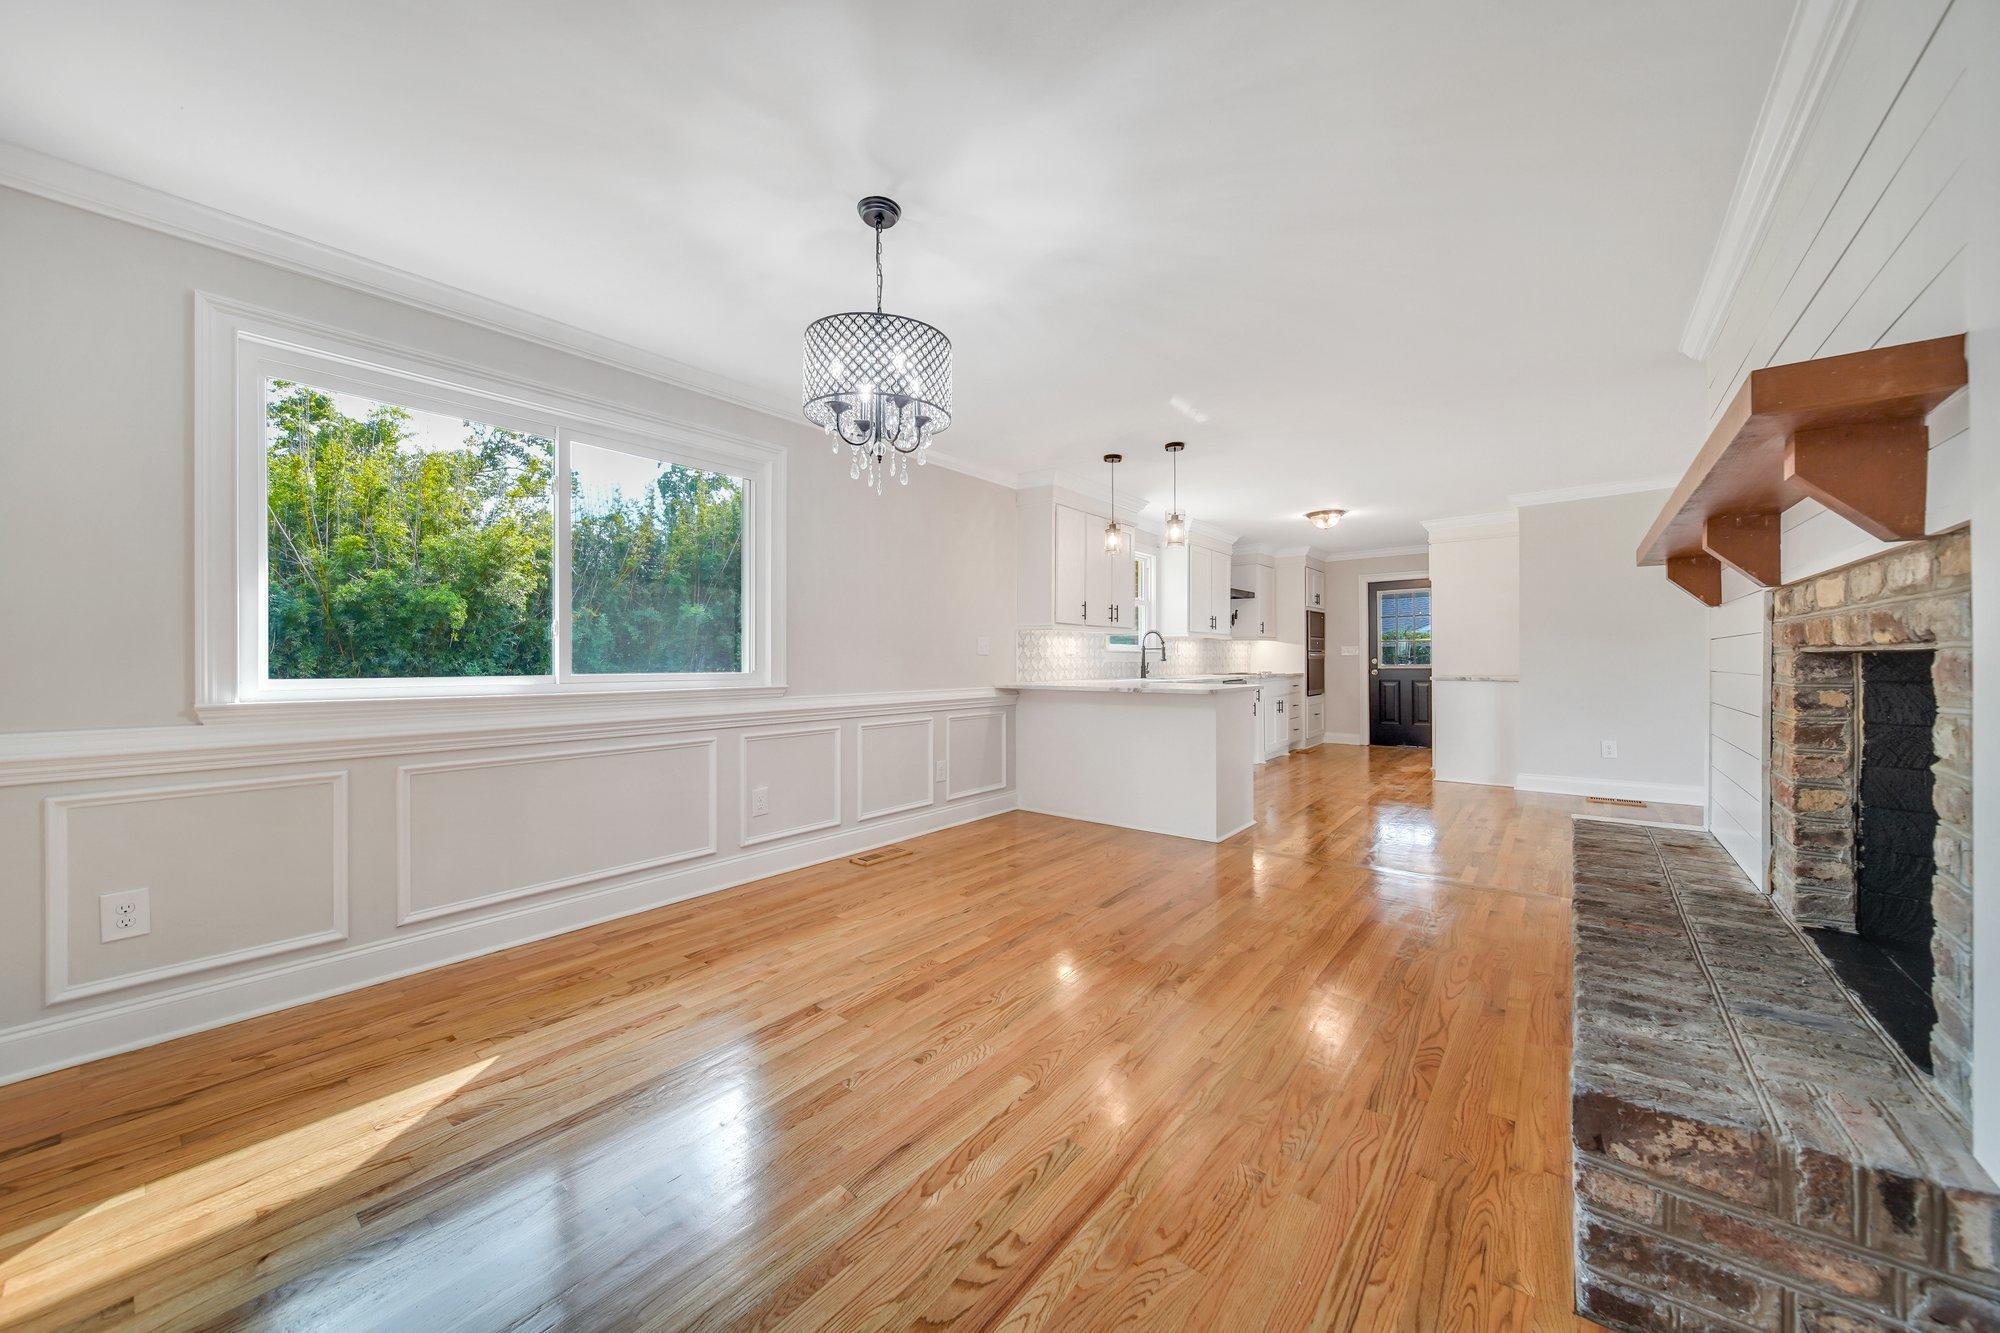 Country Club II Homes For Sale - 1477 Burningtree, Charleston, SC - 4